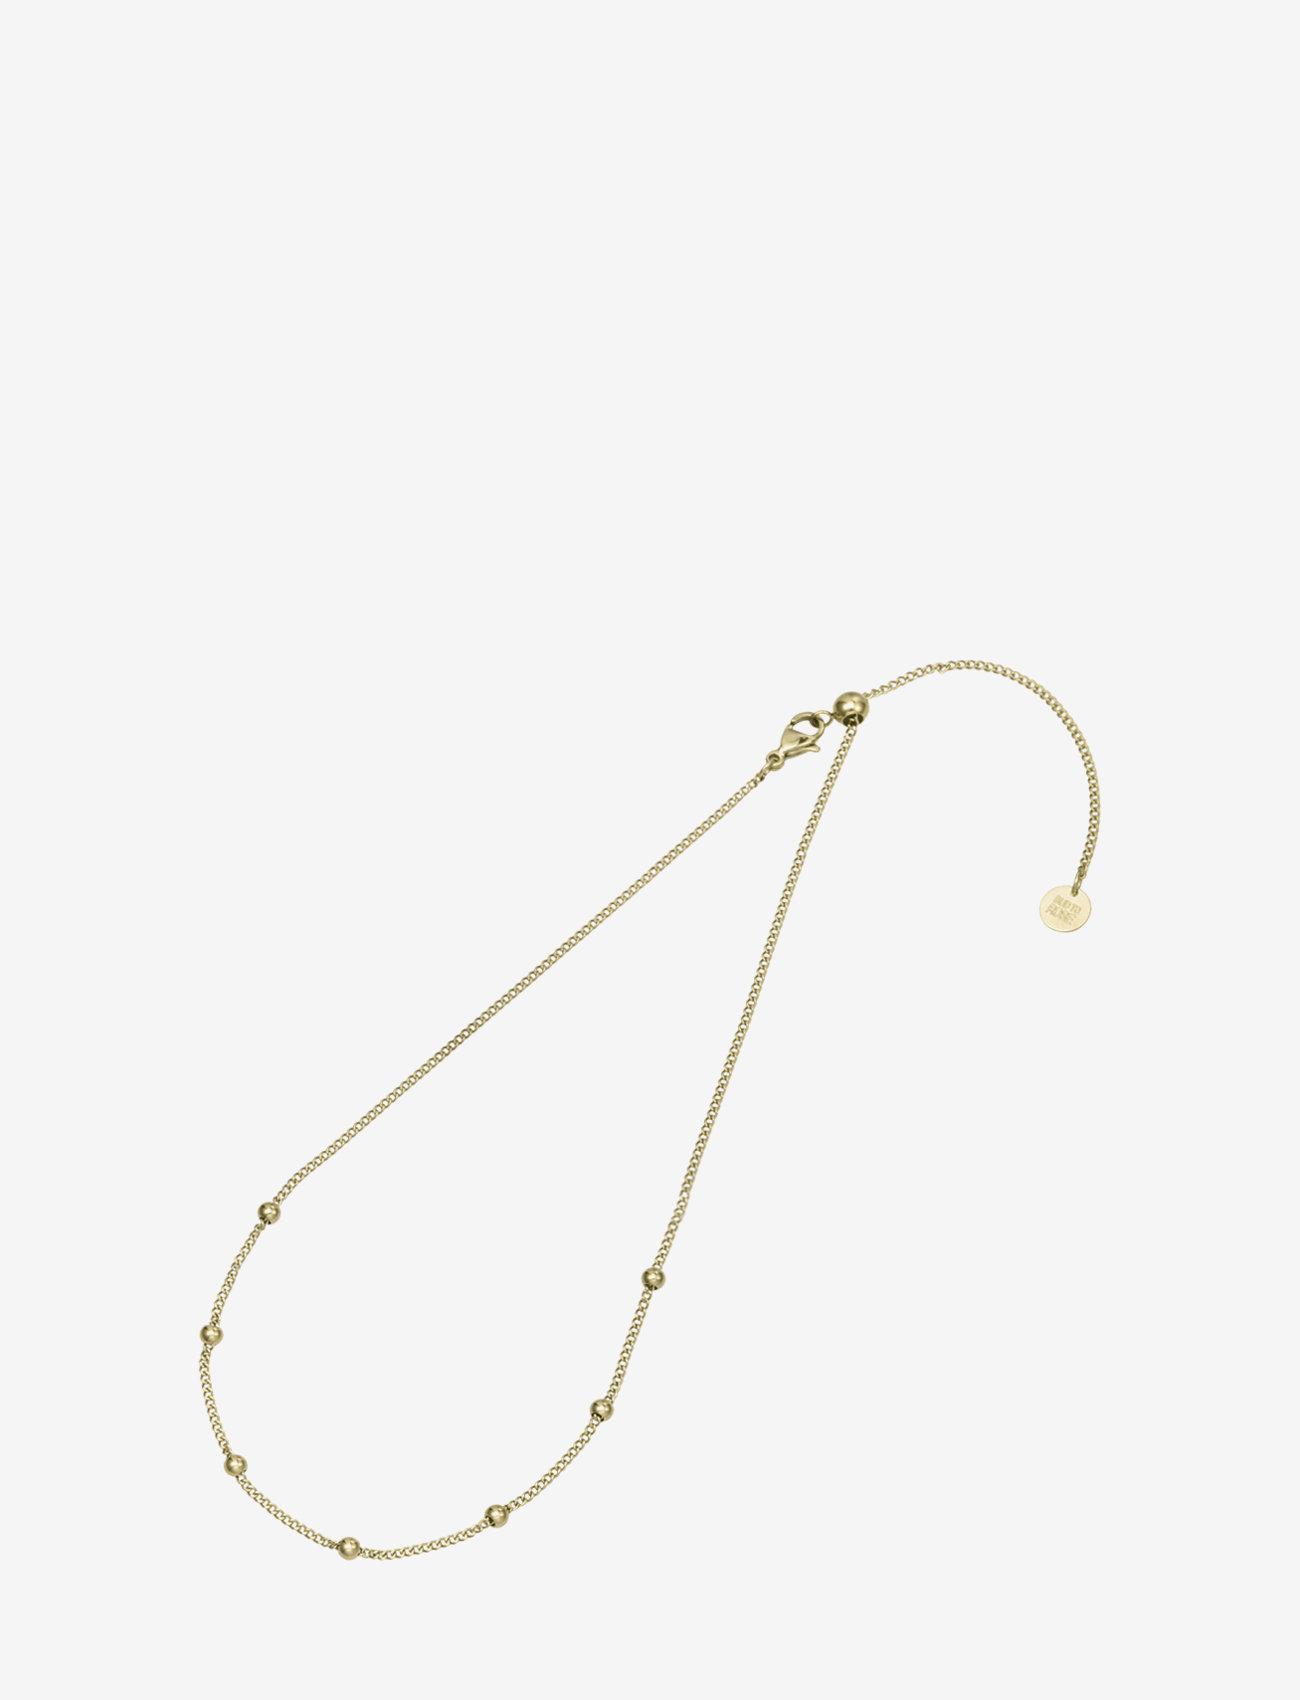 Bud to rose - Globe Choker Necklace Steel - kettingen met hanger - gold - 1